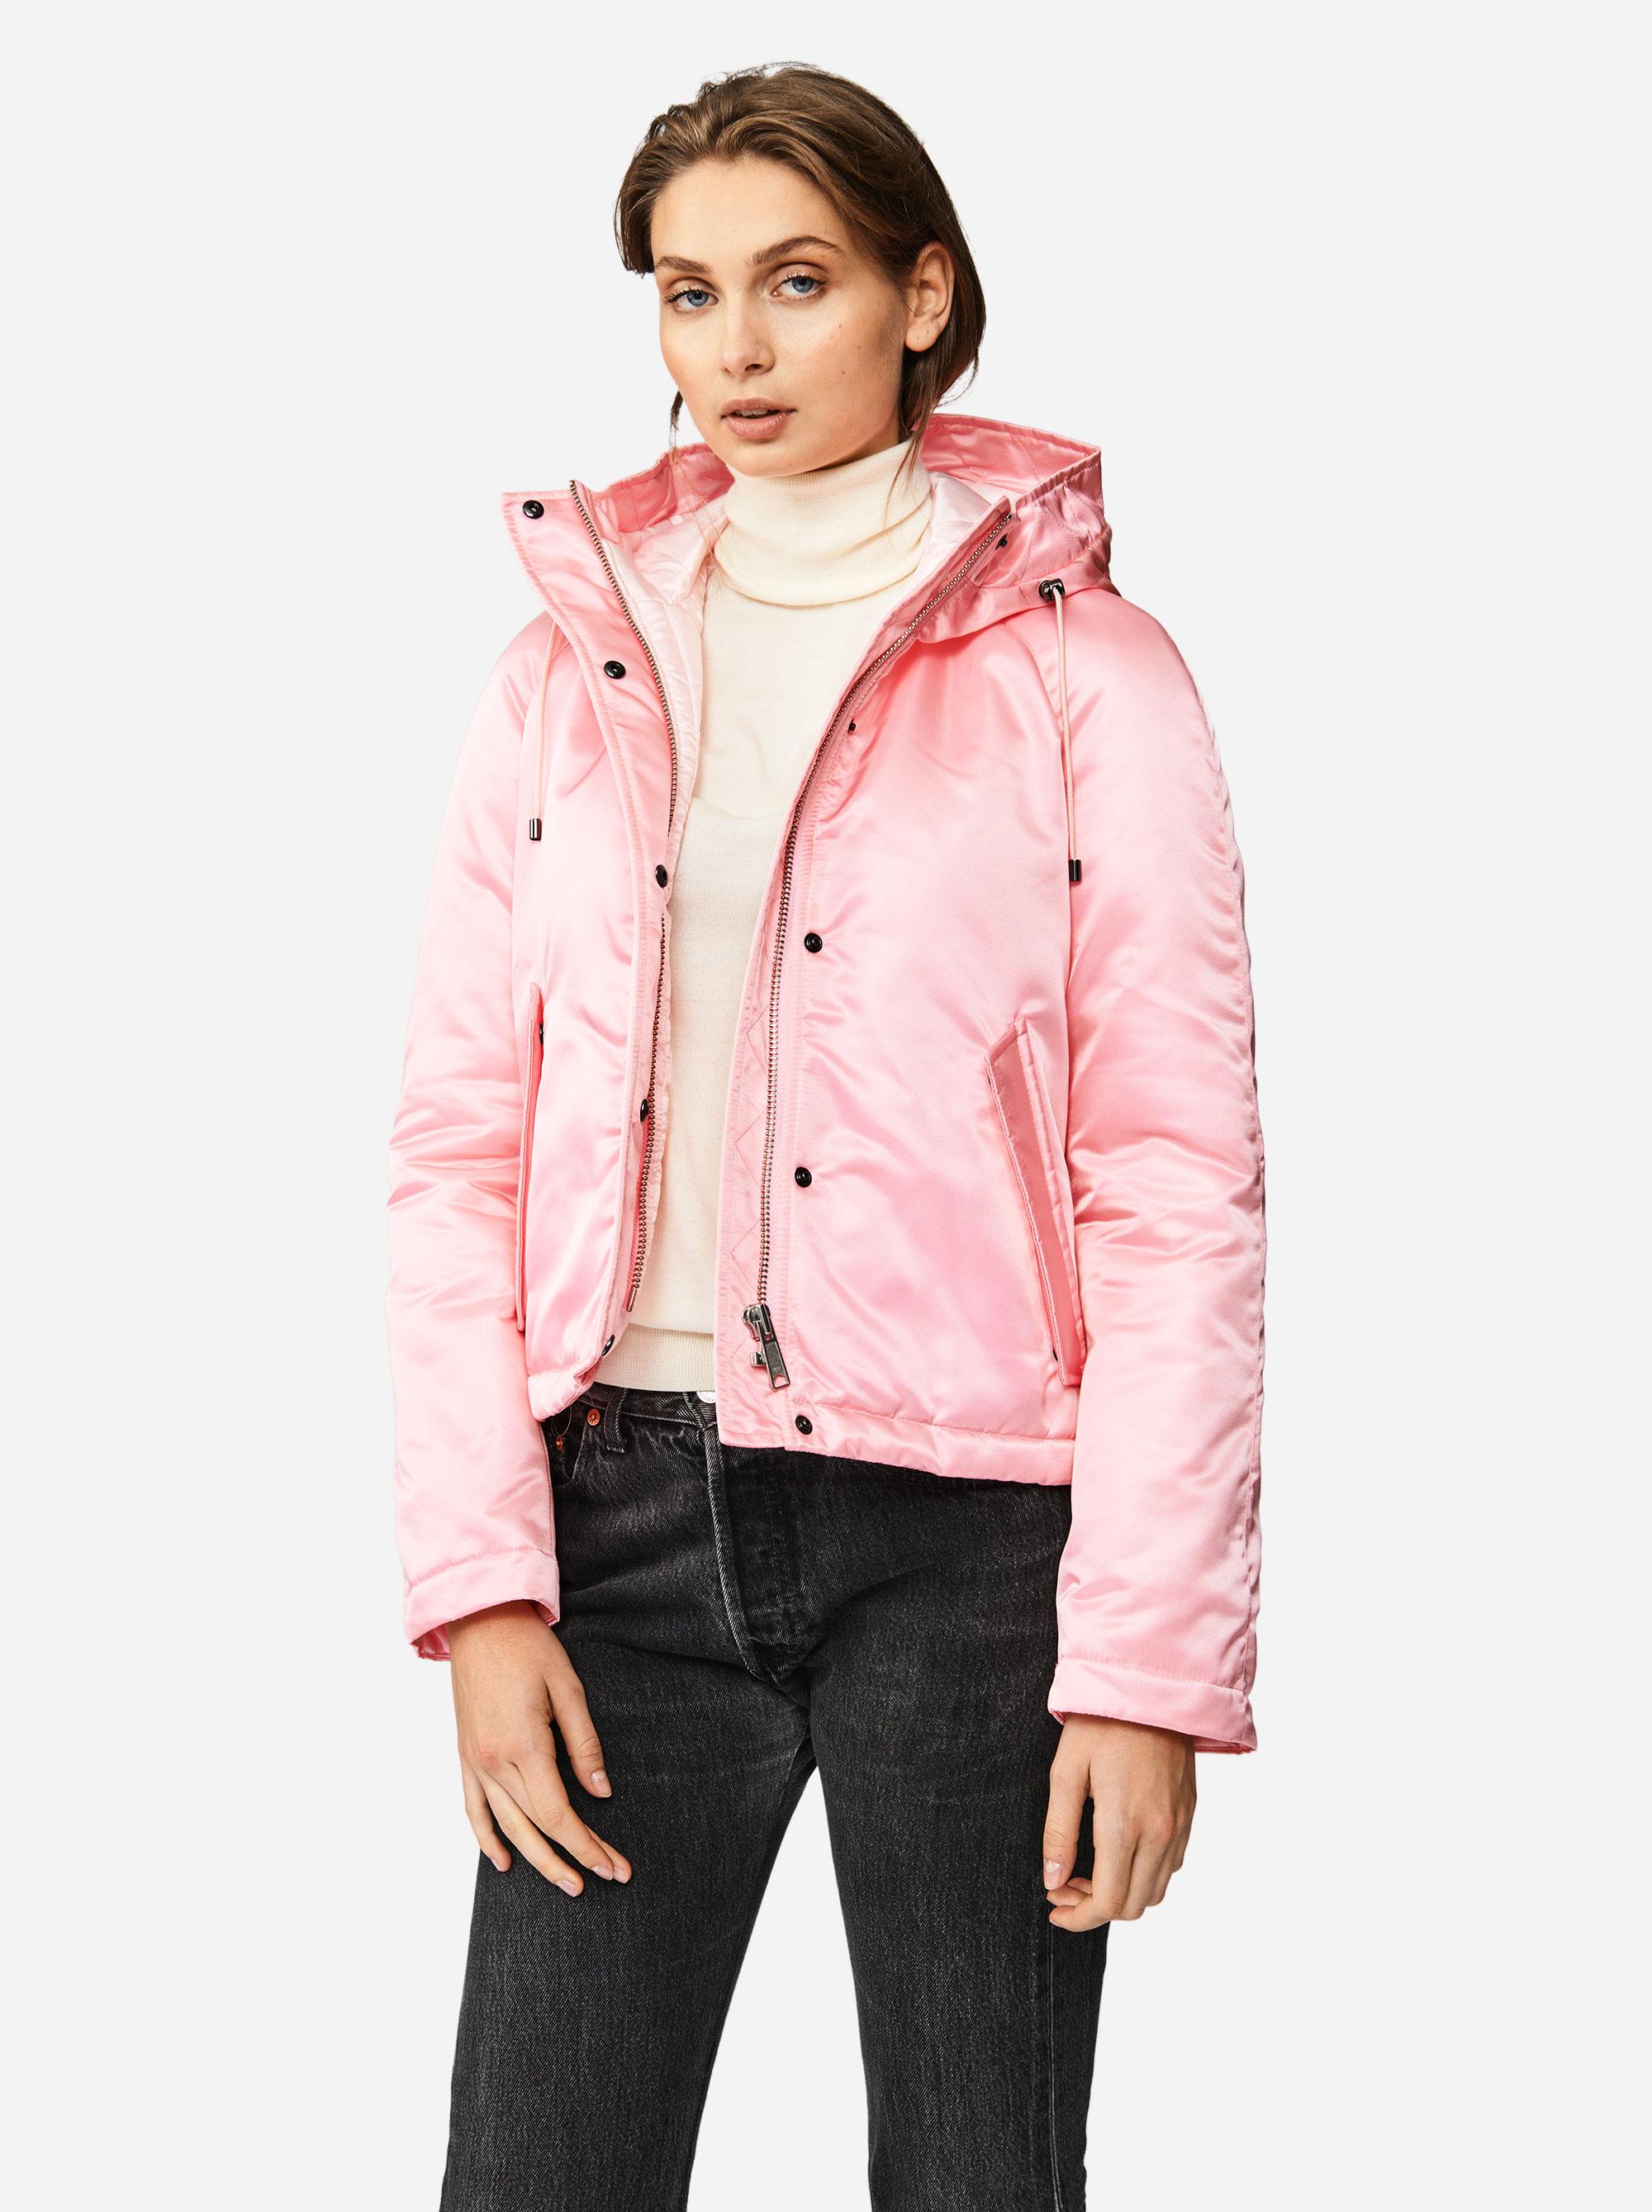 Teym - The Parka - Women - Pink - Short - 3